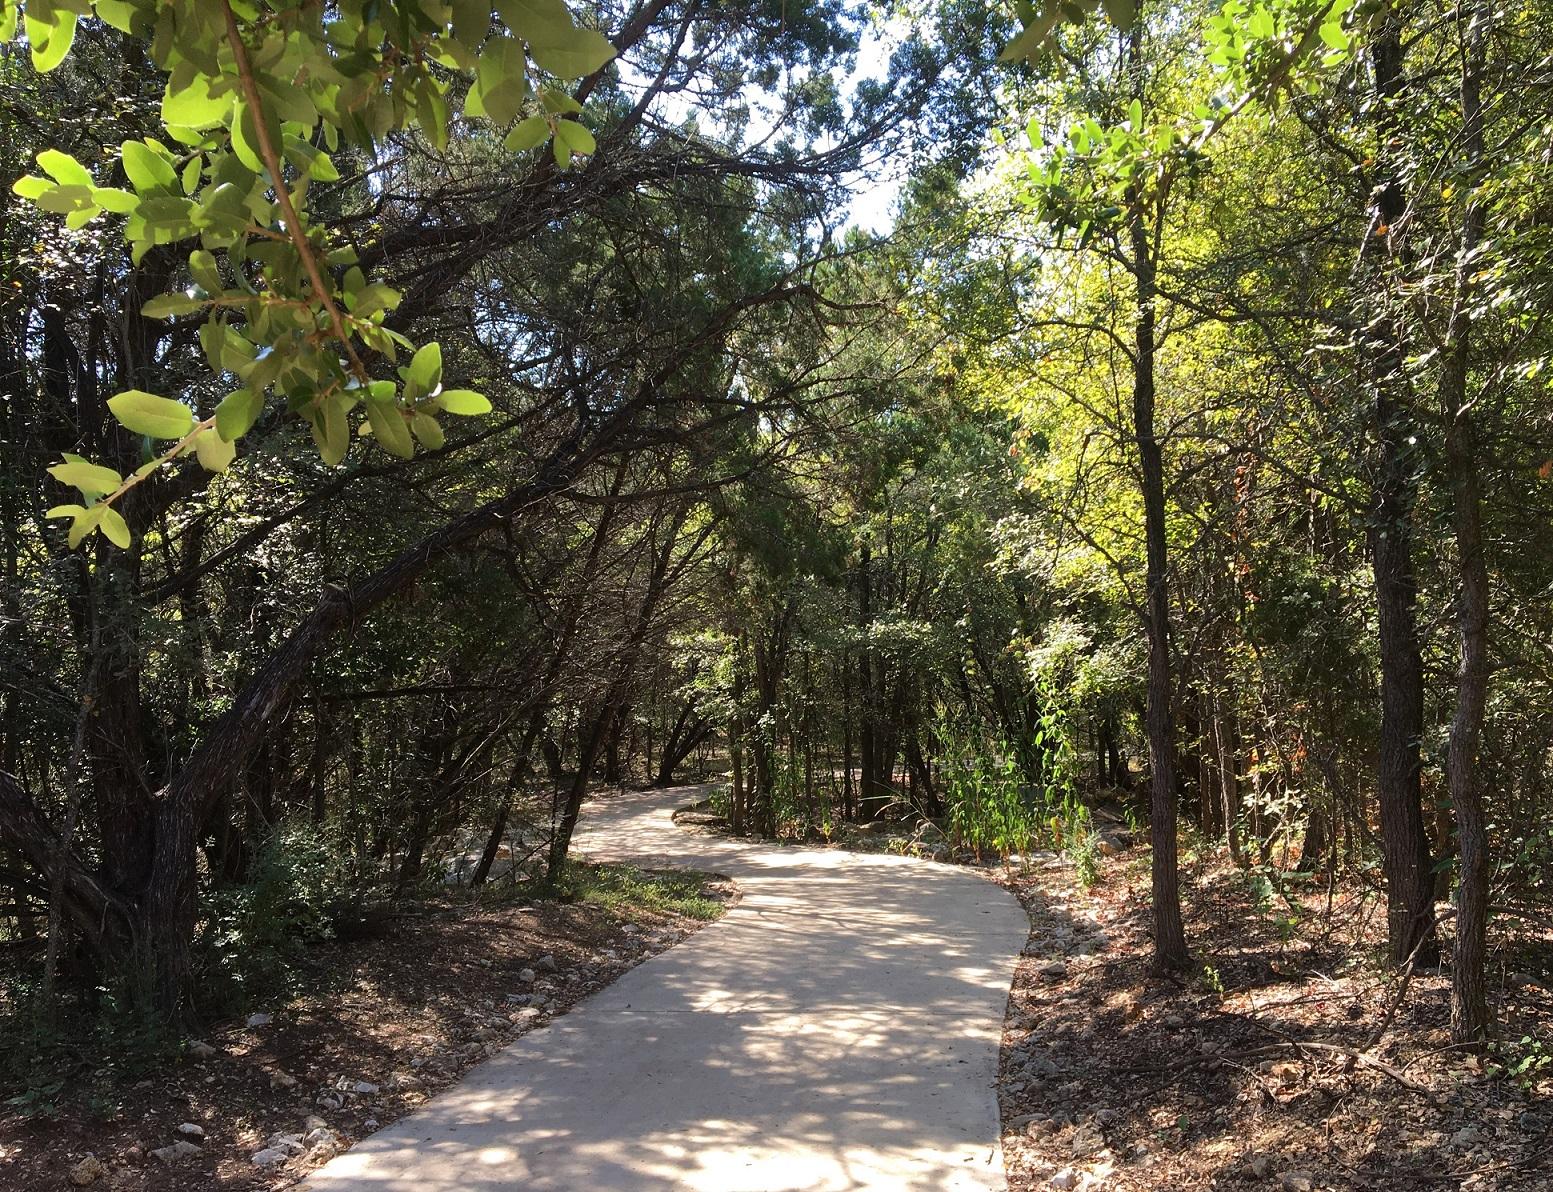 Reminder – Violet Crown Trail via Dick Nichols Park walk on Sep 25th